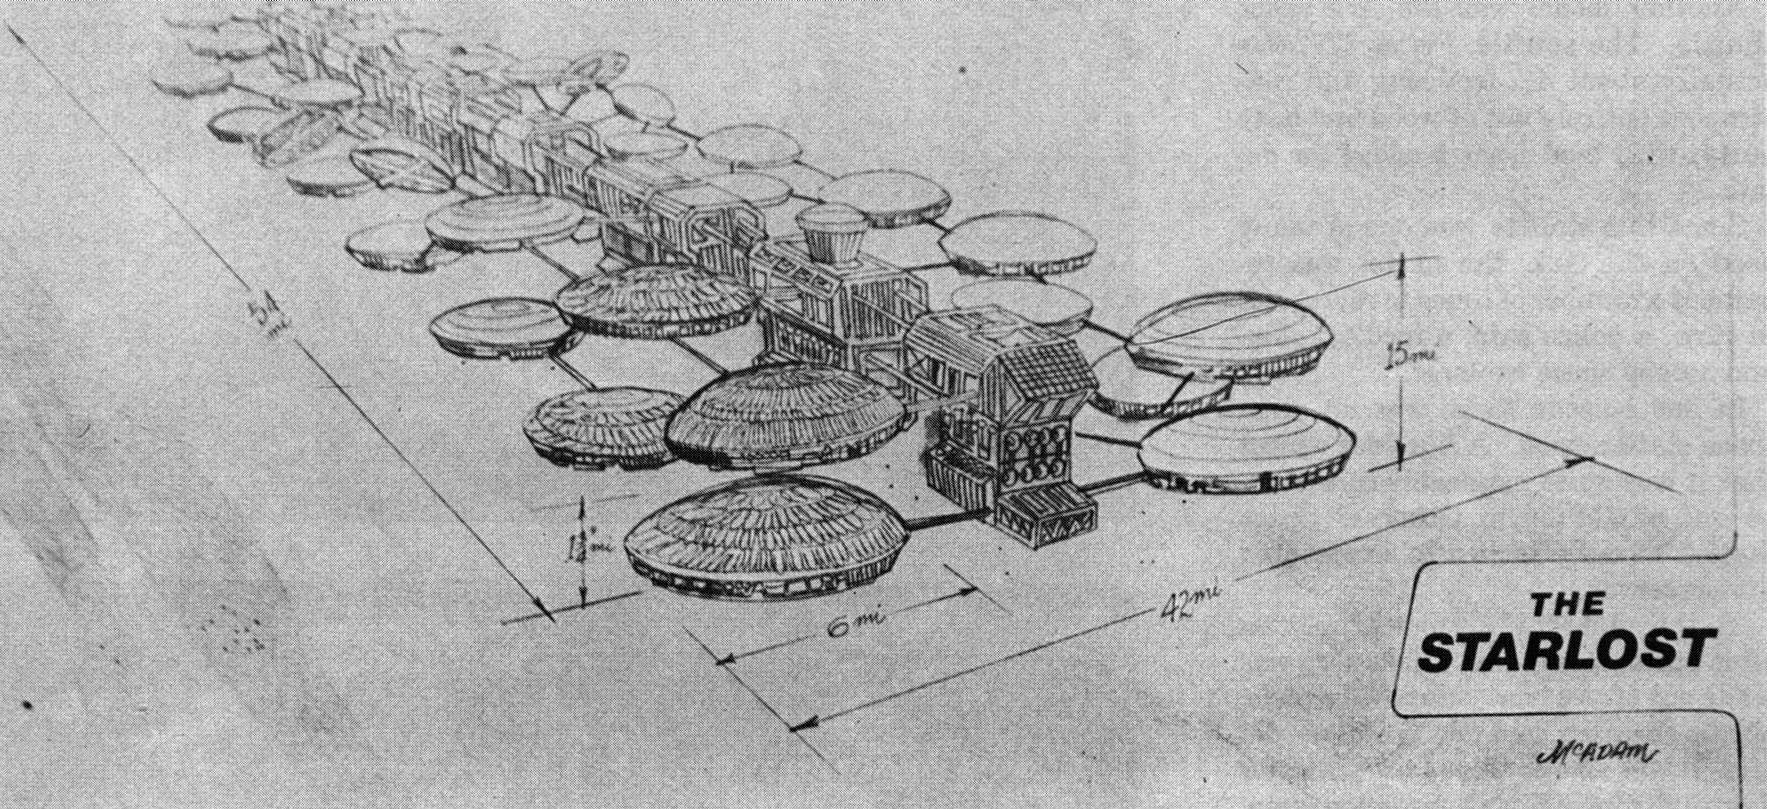 Starlost ark blueprint starships and vistas pinterest sci fi starlost ark blueprint malvernweather Image collections